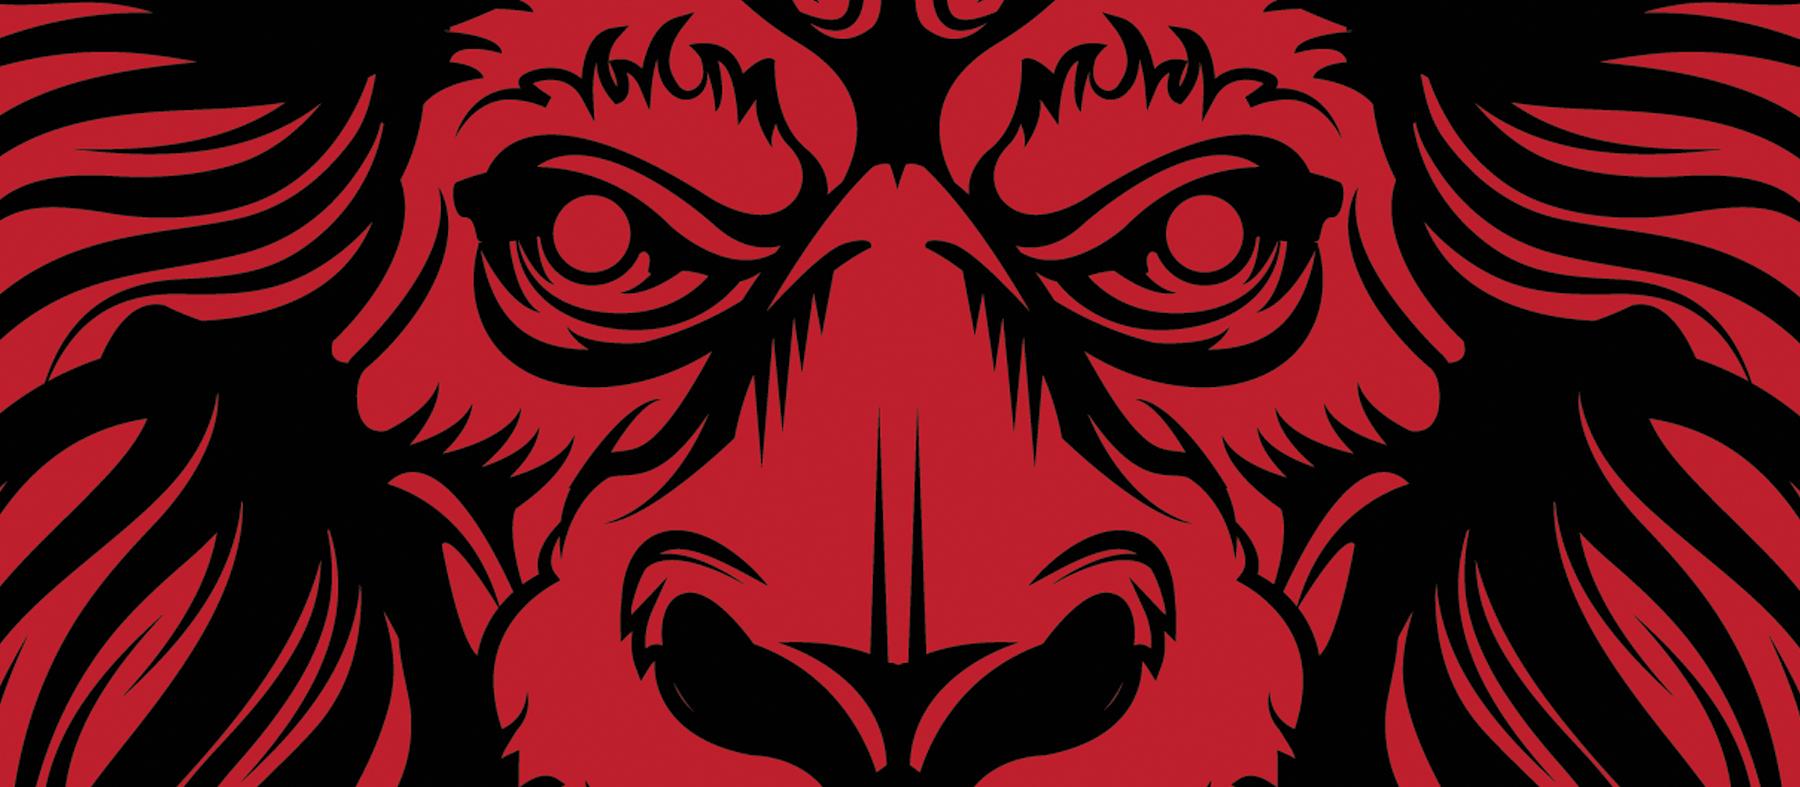 LION_illustration2.jpg